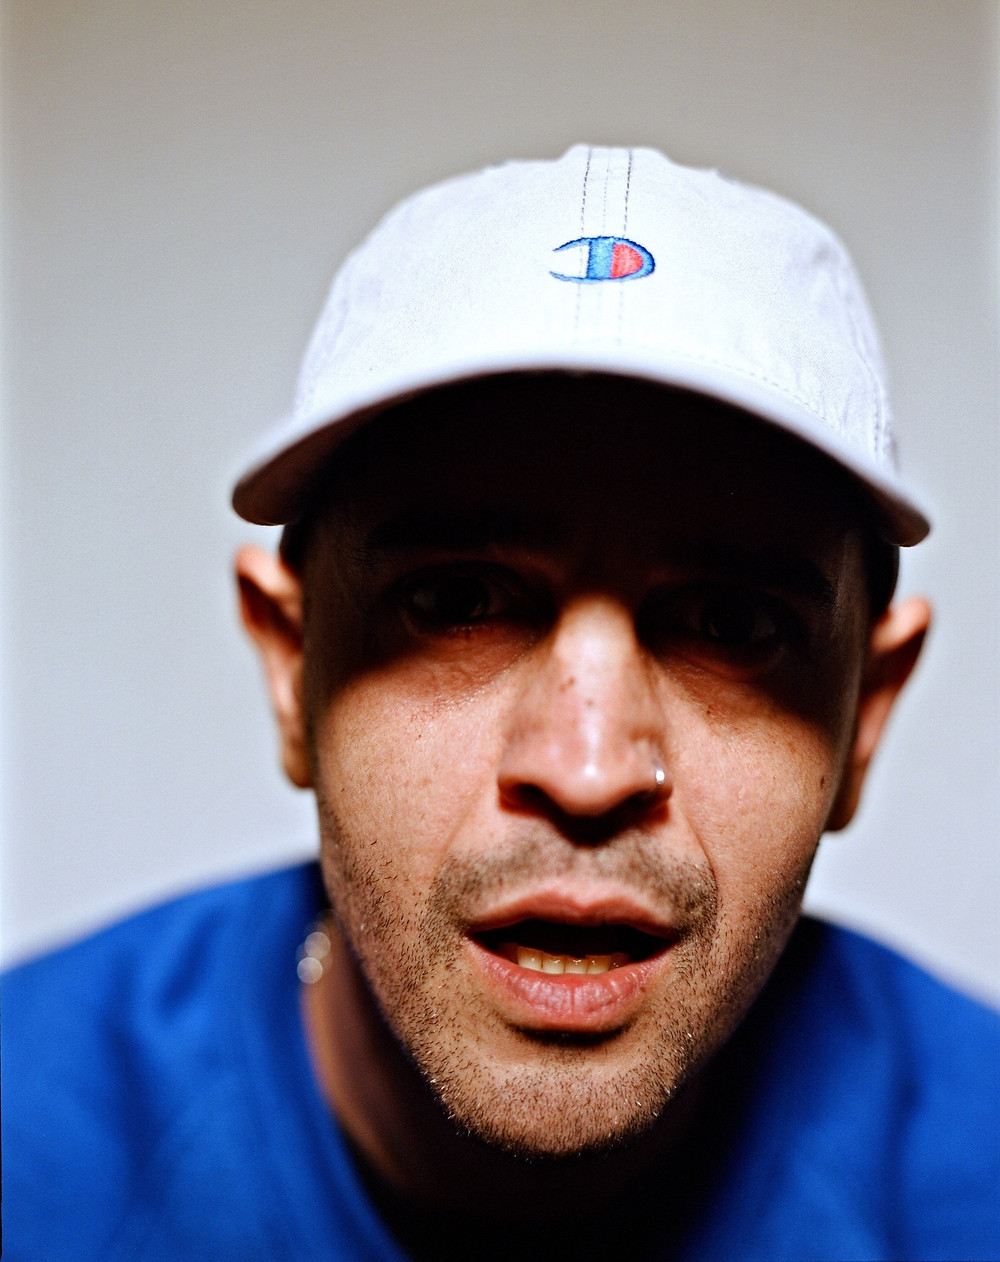 Dabbla in white cap looking into camera in blue sweatshirt.